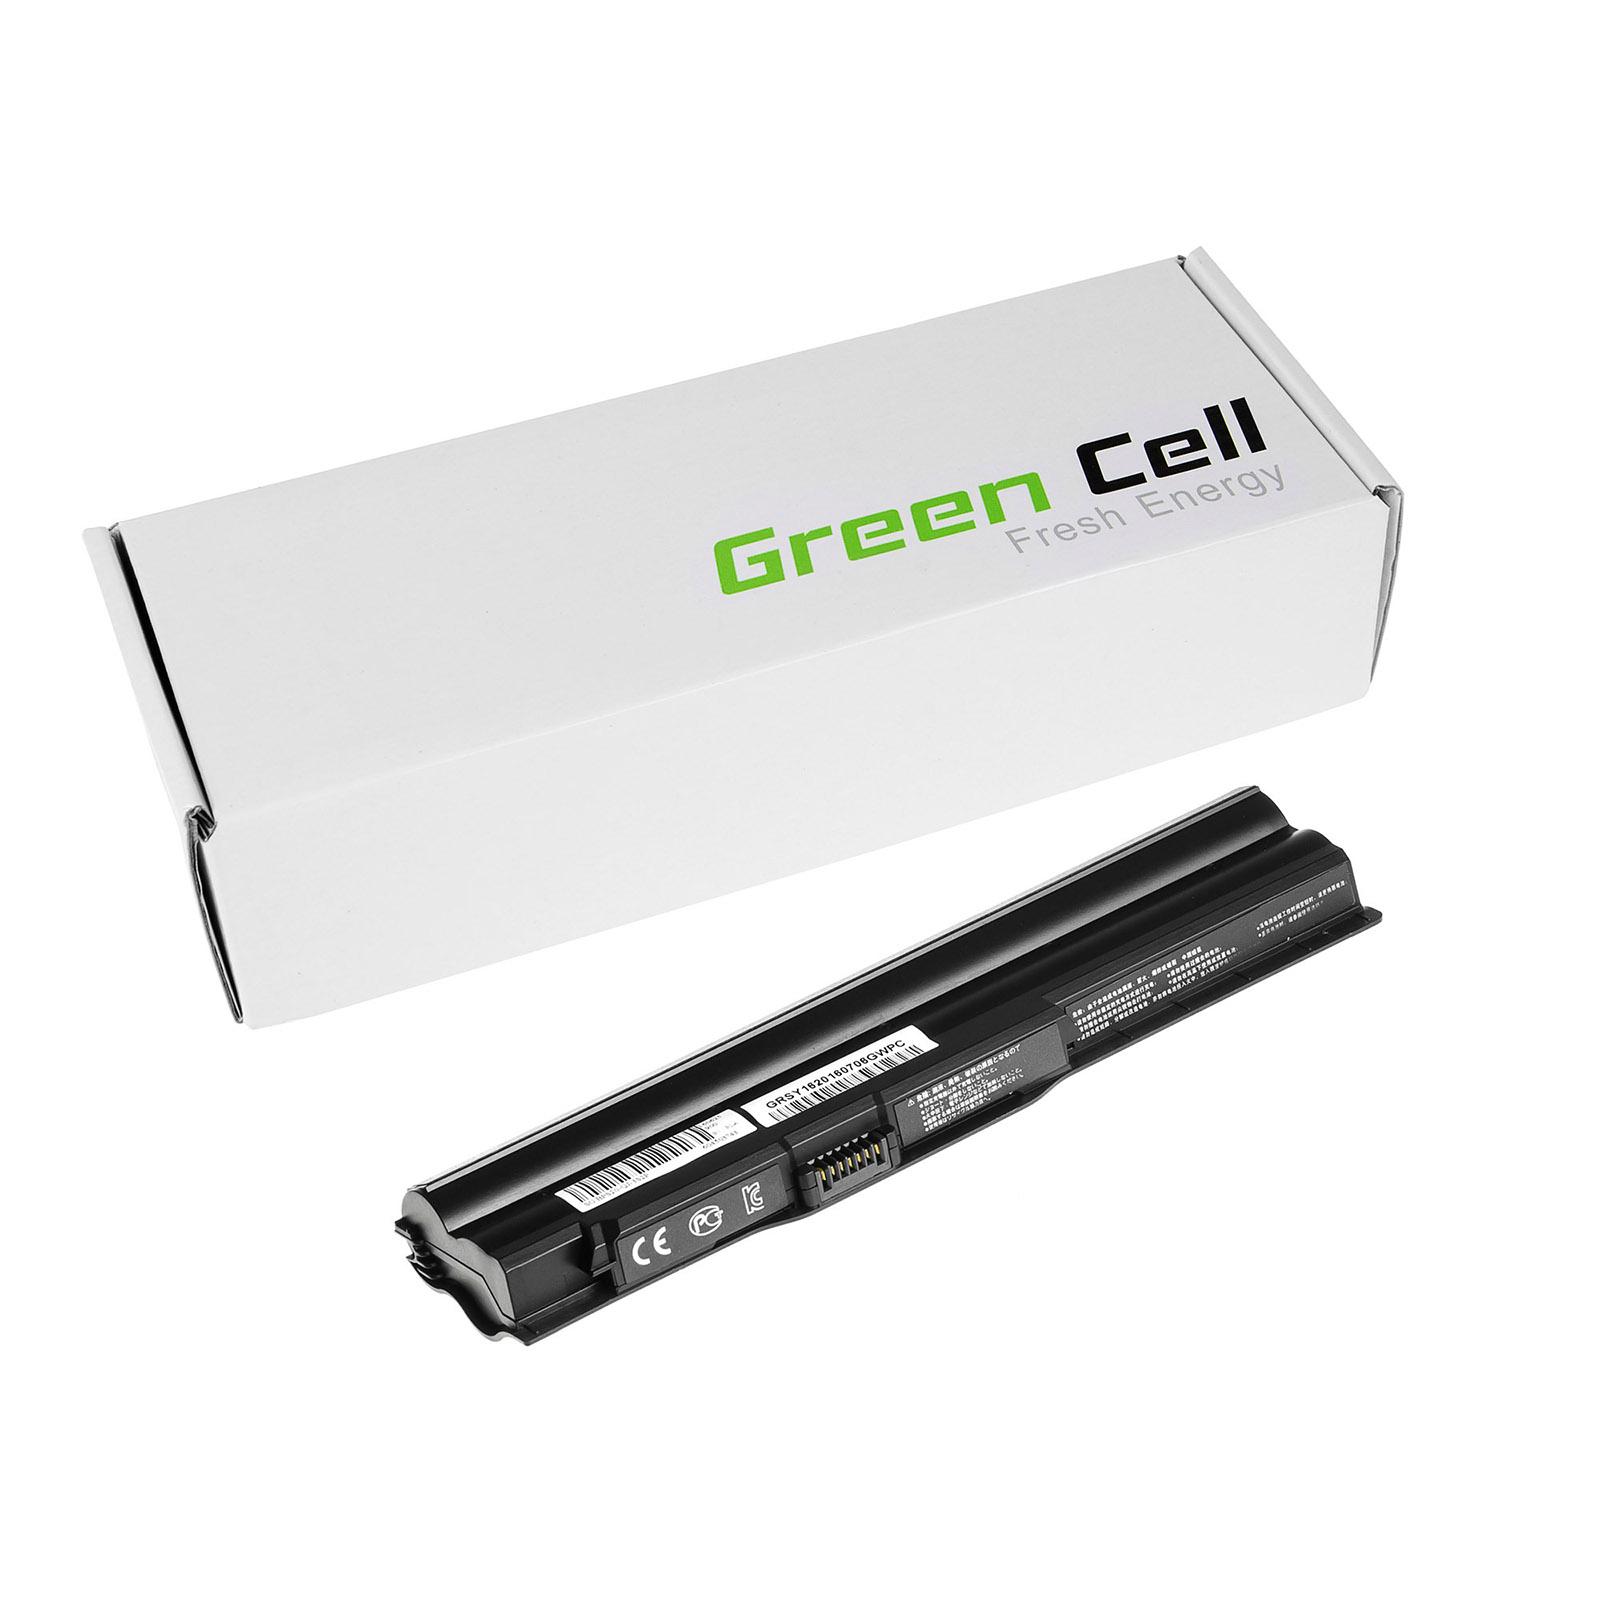 green cell akku f r sony vaio vpcz12l9e b laptop 4400mah. Black Bedroom Furniture Sets. Home Design Ideas